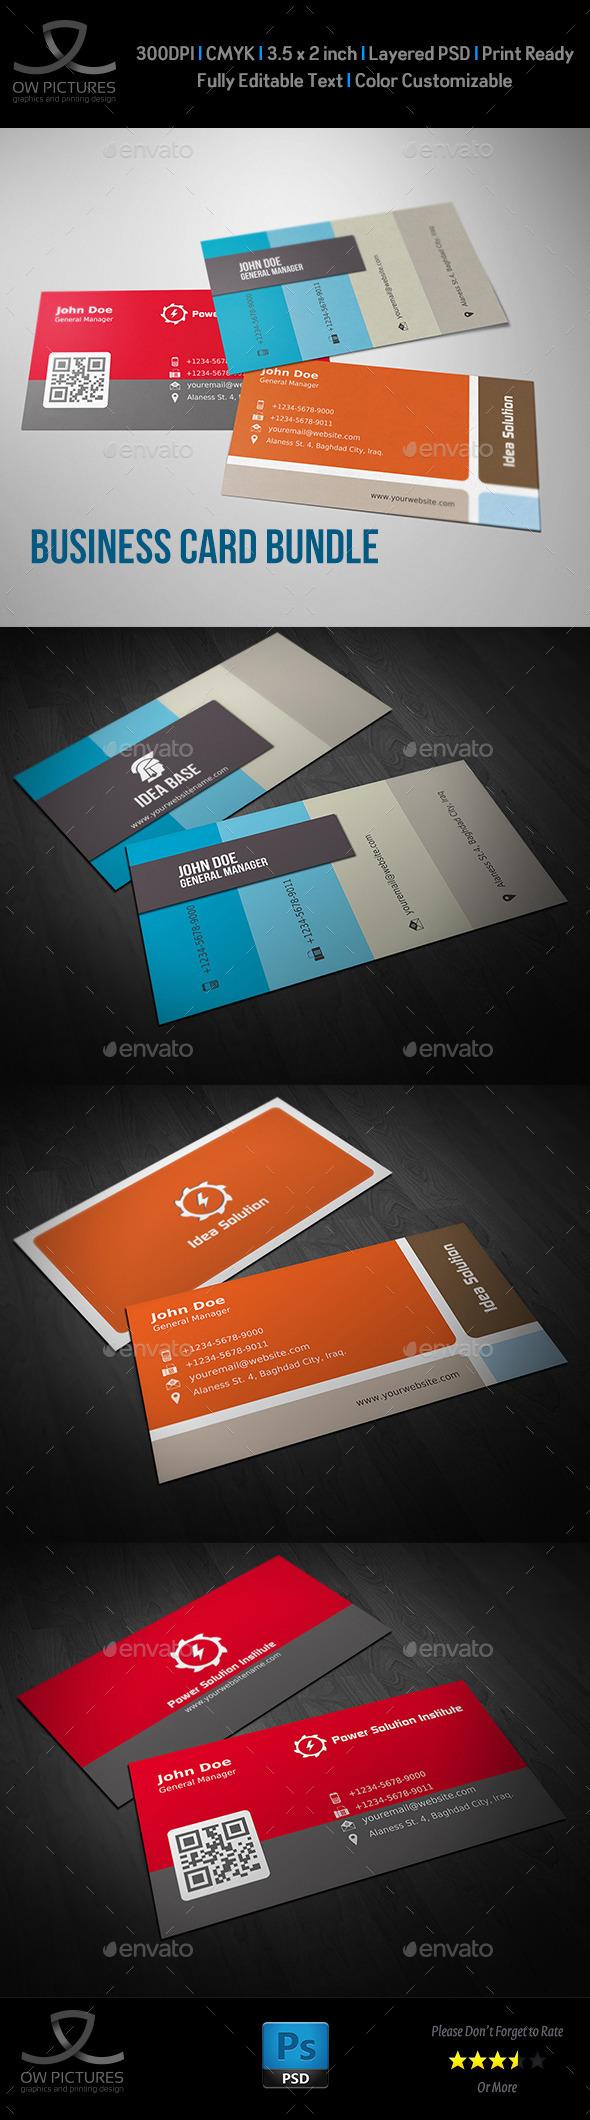 Corporate Business Card Bundle Vol.5 - Corporate Business Cards